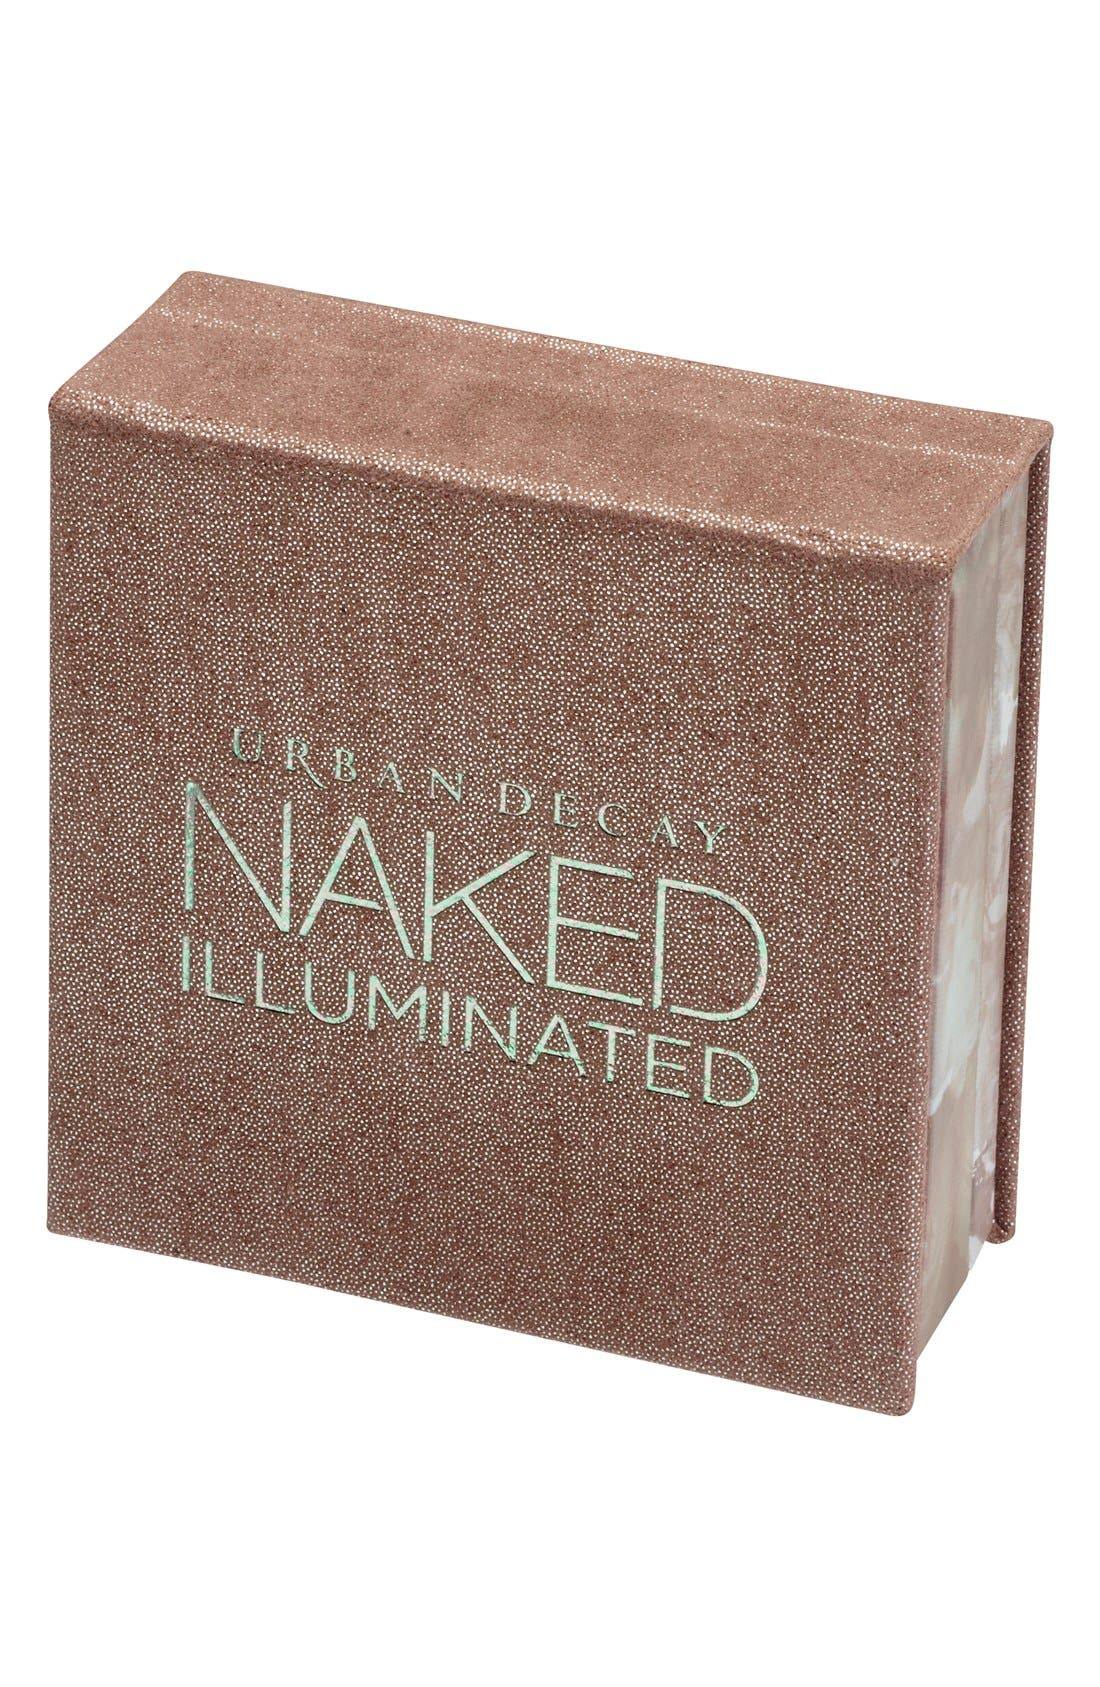 Naked Illuminated Shimmering Powder for Face & Body,                             Main thumbnail 1, color,                             LUMINOUS